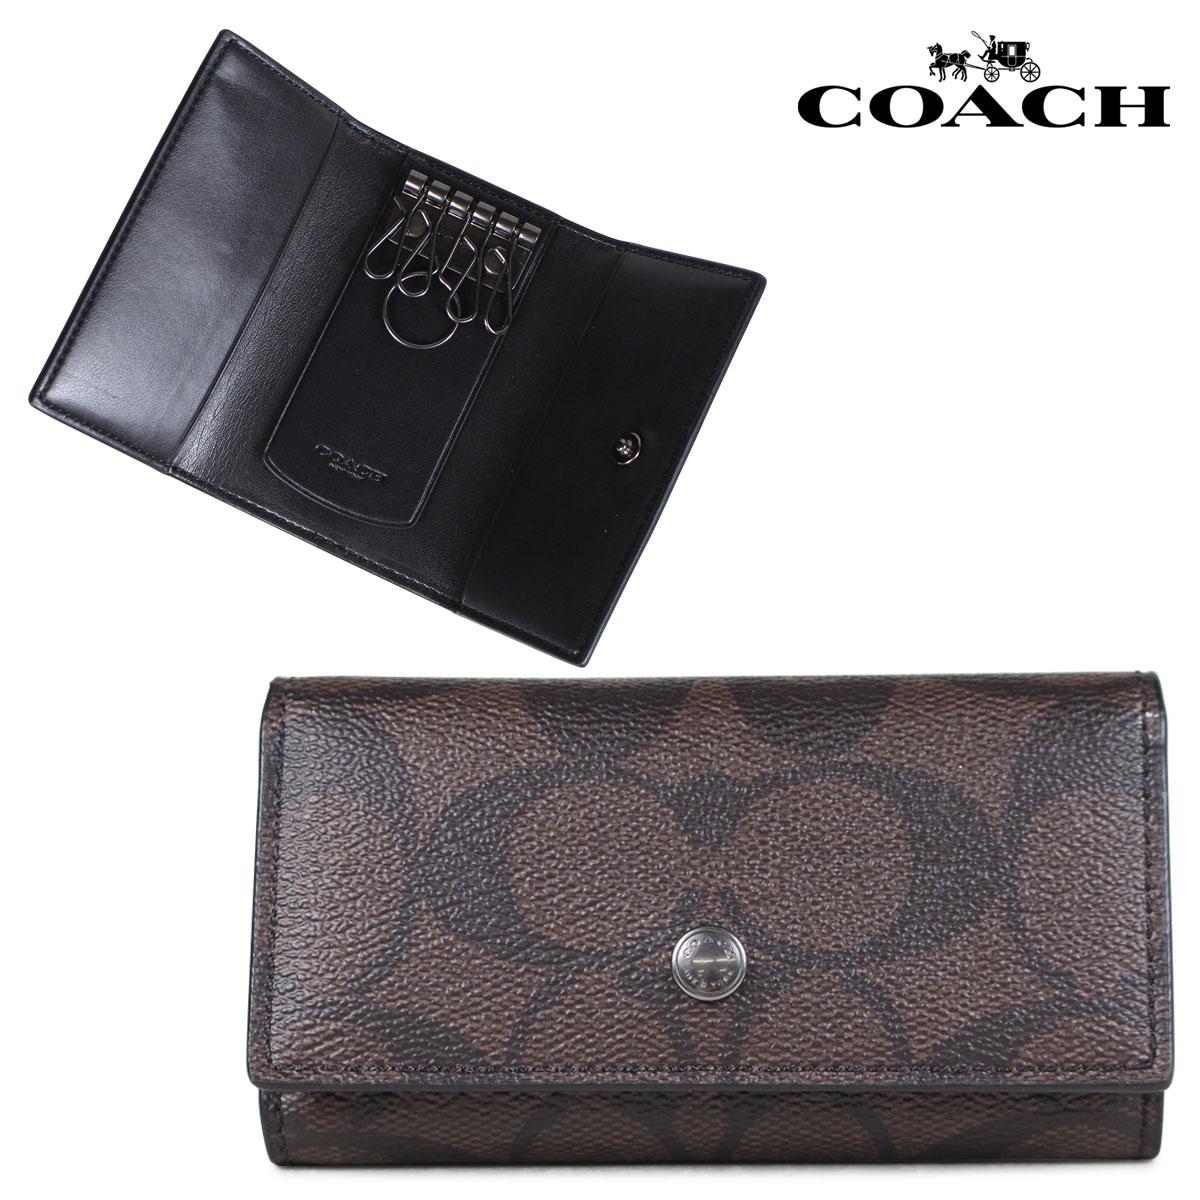 6cff663c COACH coach key case men gap Dis leather brown F26104